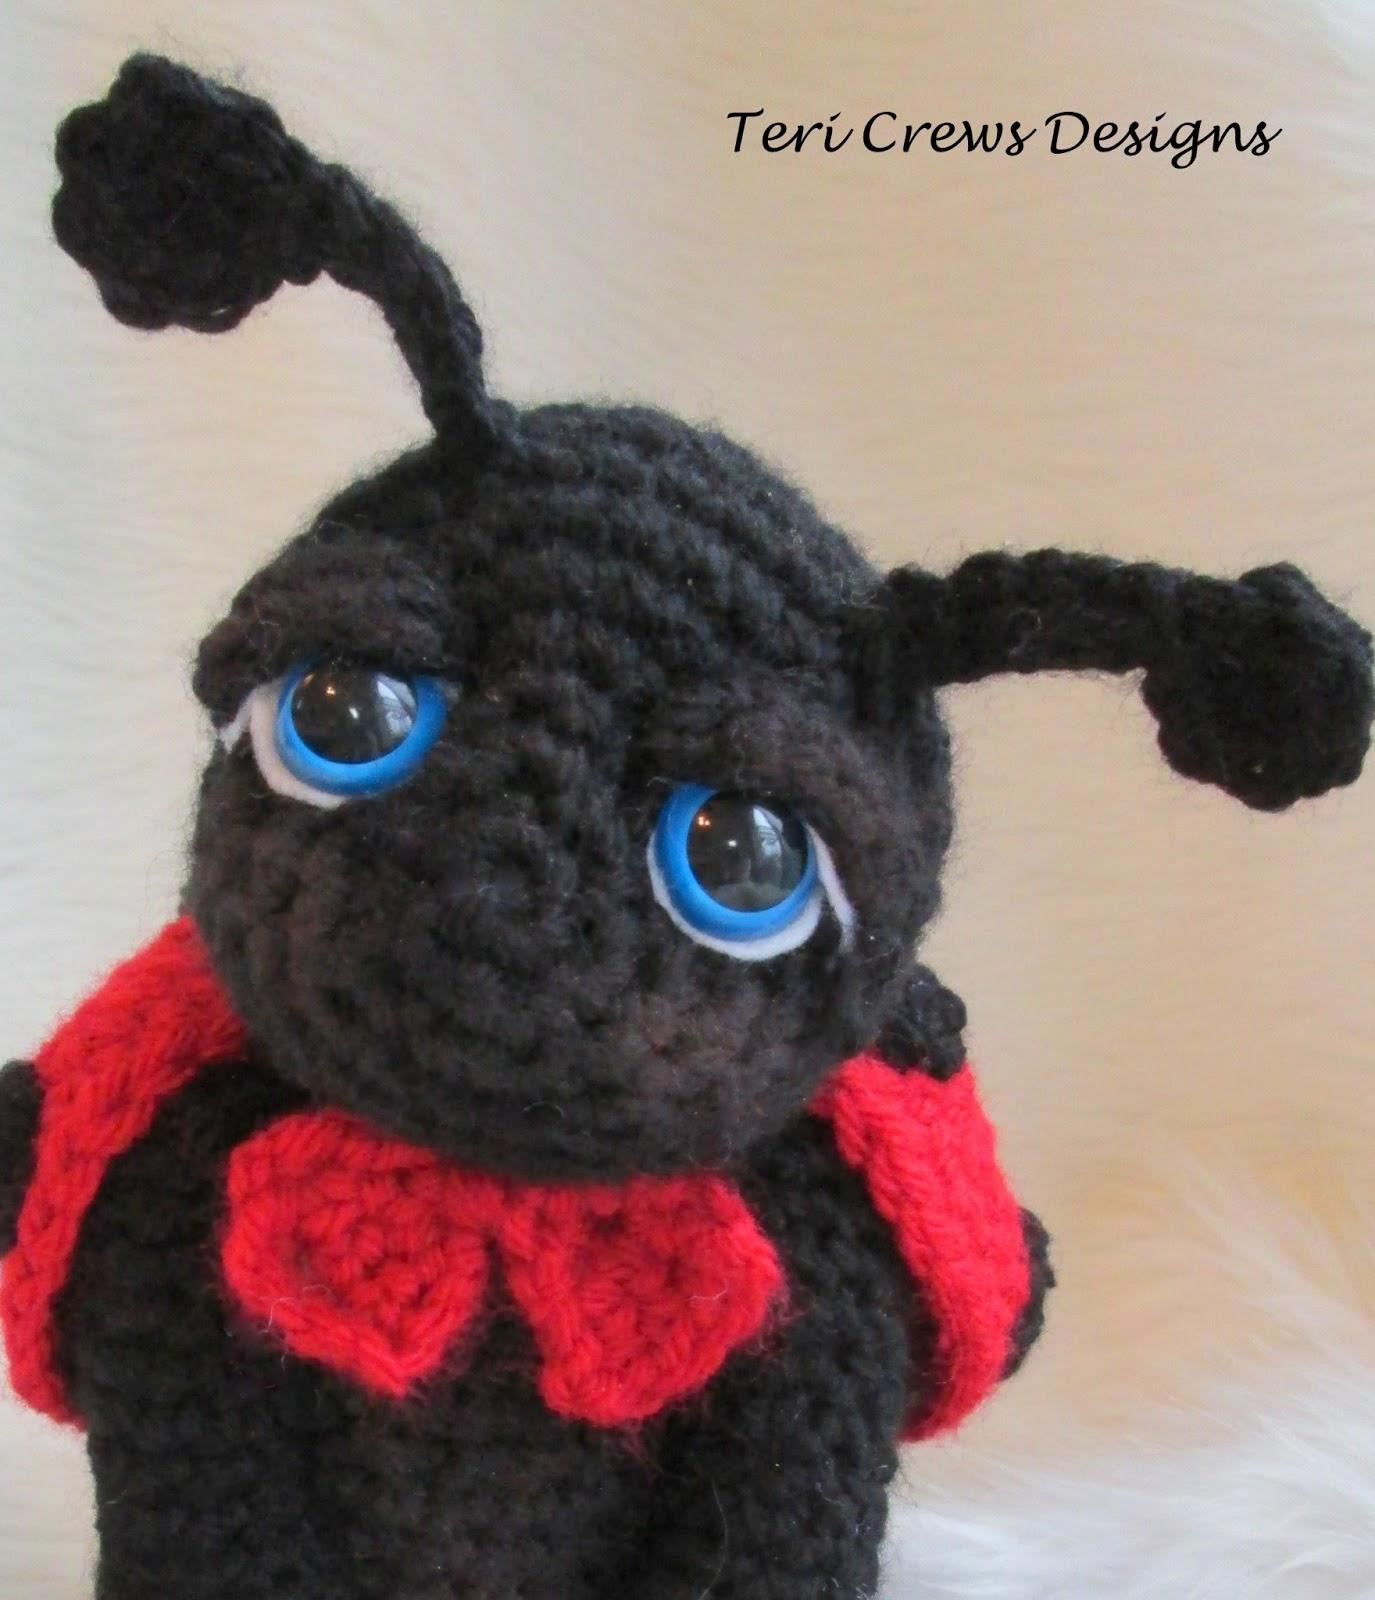 Ladybug Amigurumi Crochet Pattern Free : Teris Blog: New Free Ladybug Pattern